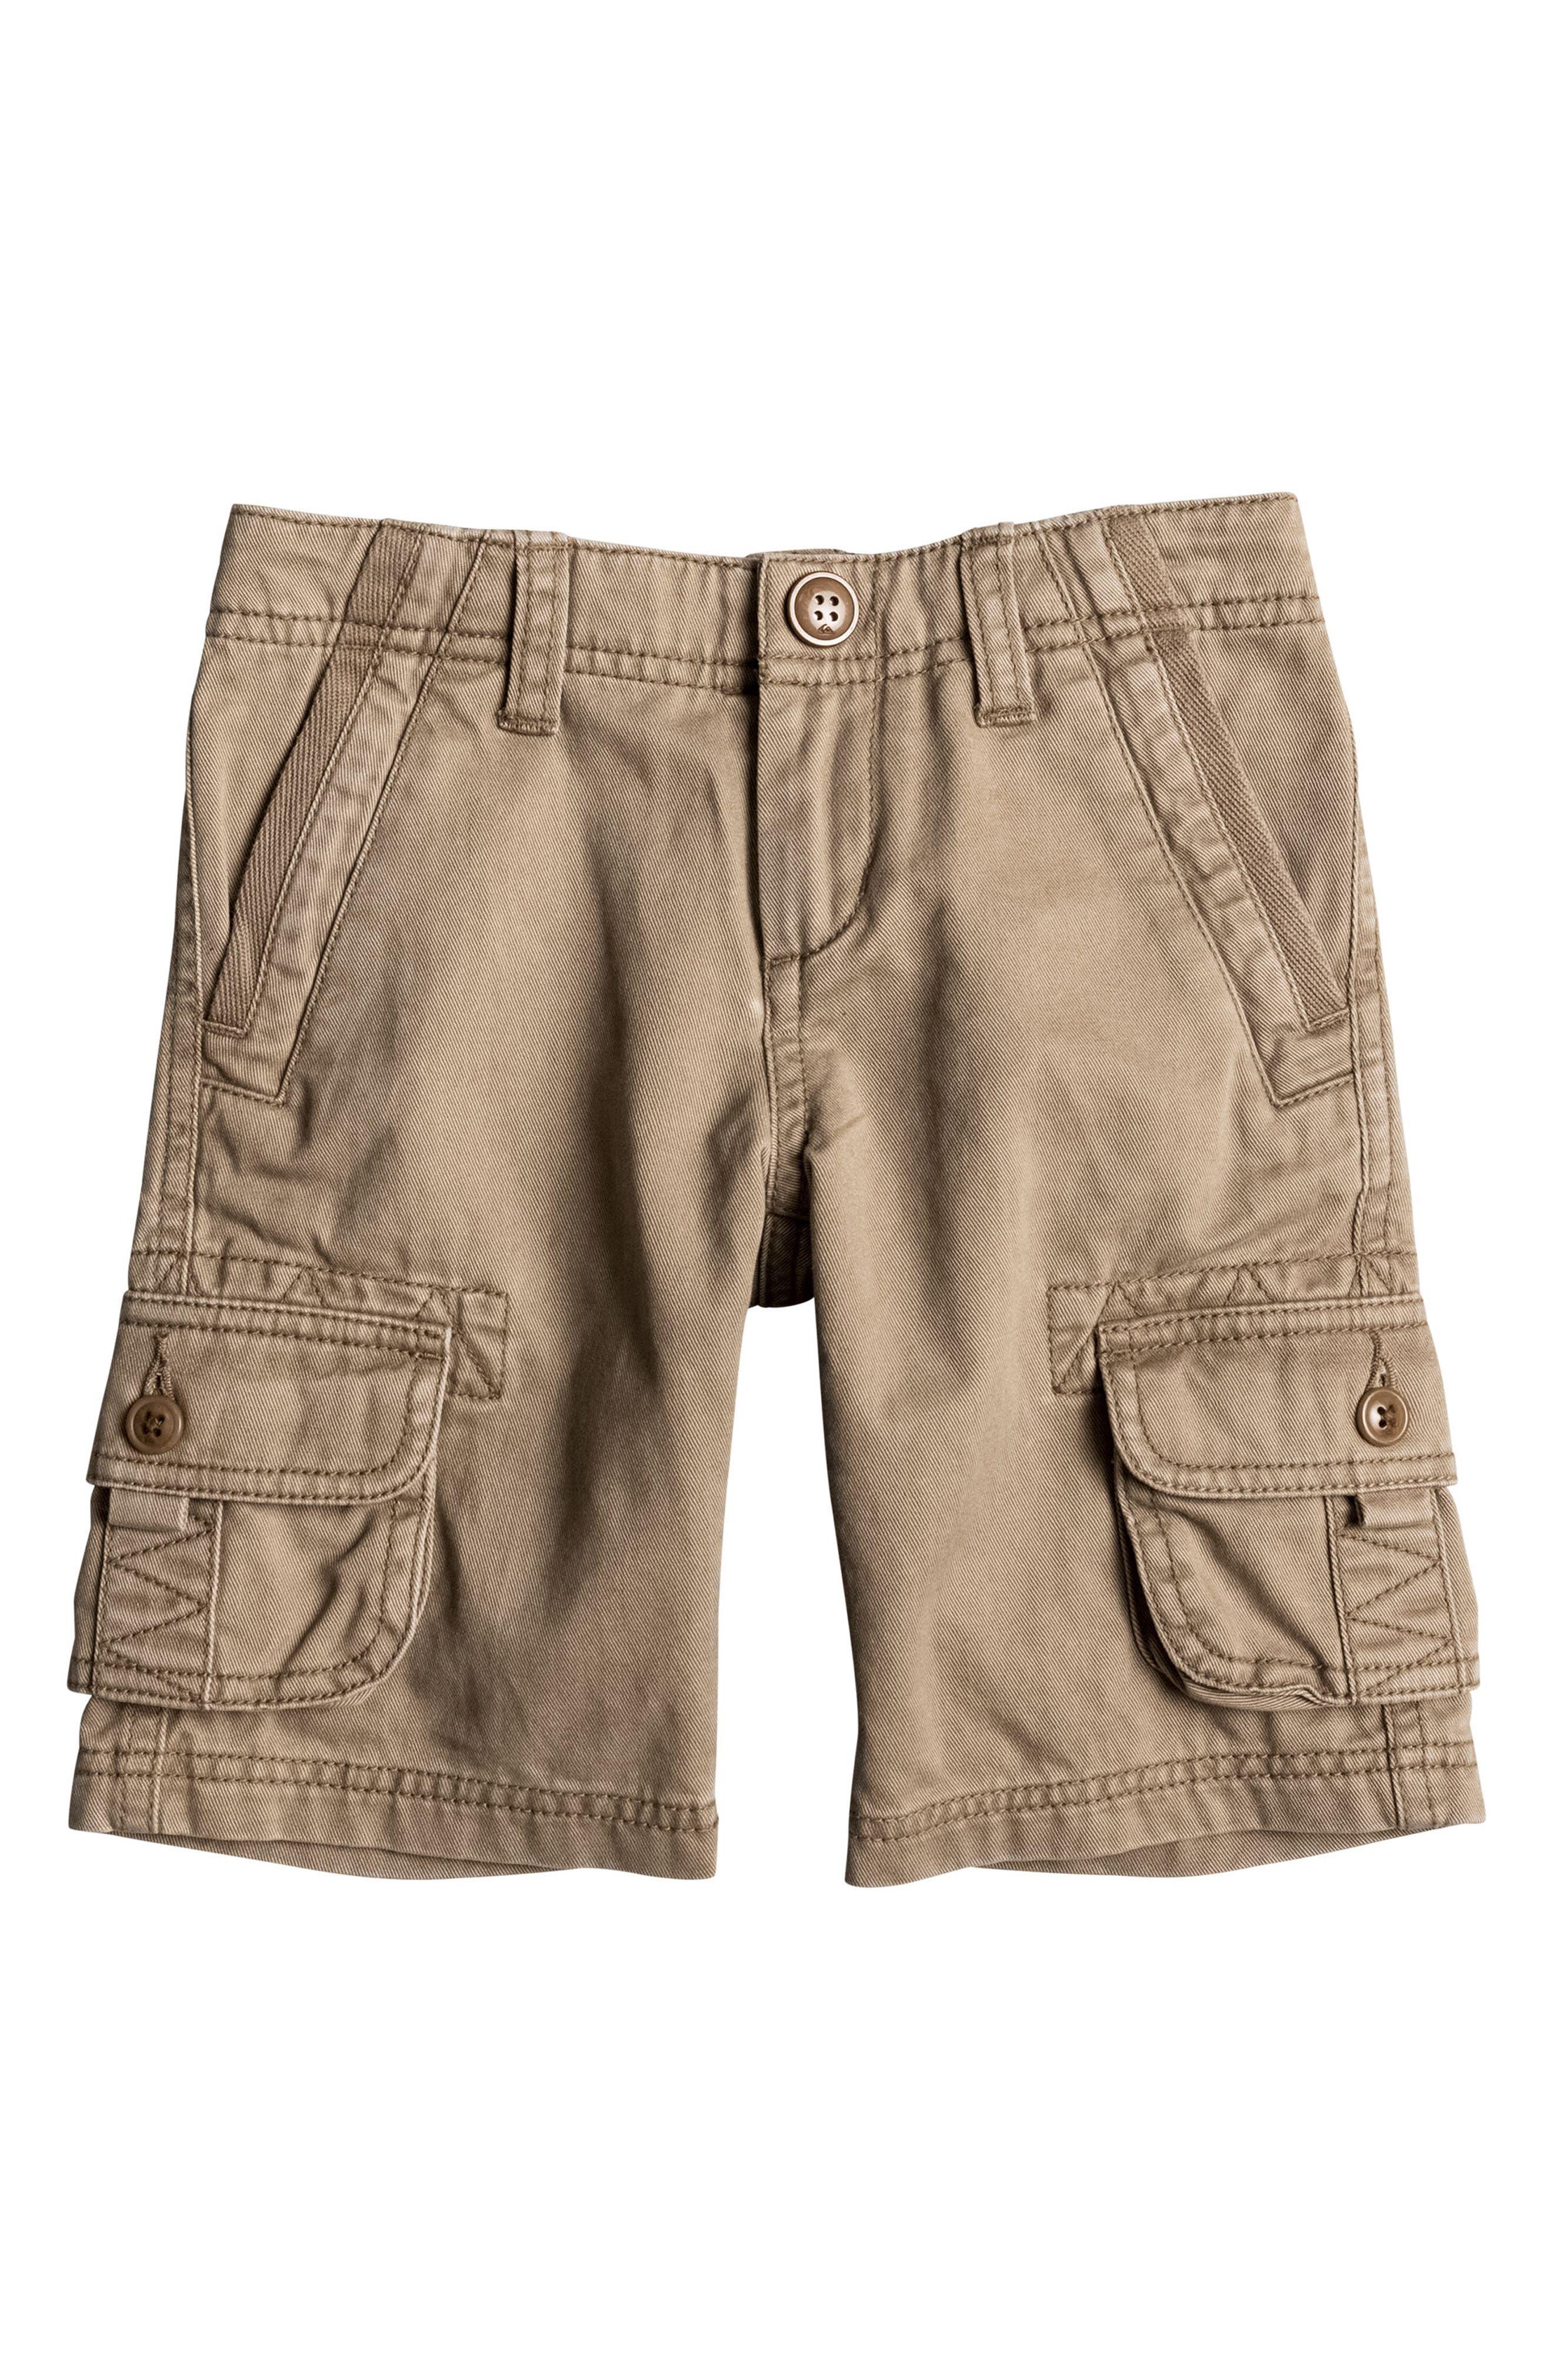 Quiksilver Everyday Deluxe Cargo Shorts (Toddler Boys & Little Boys)